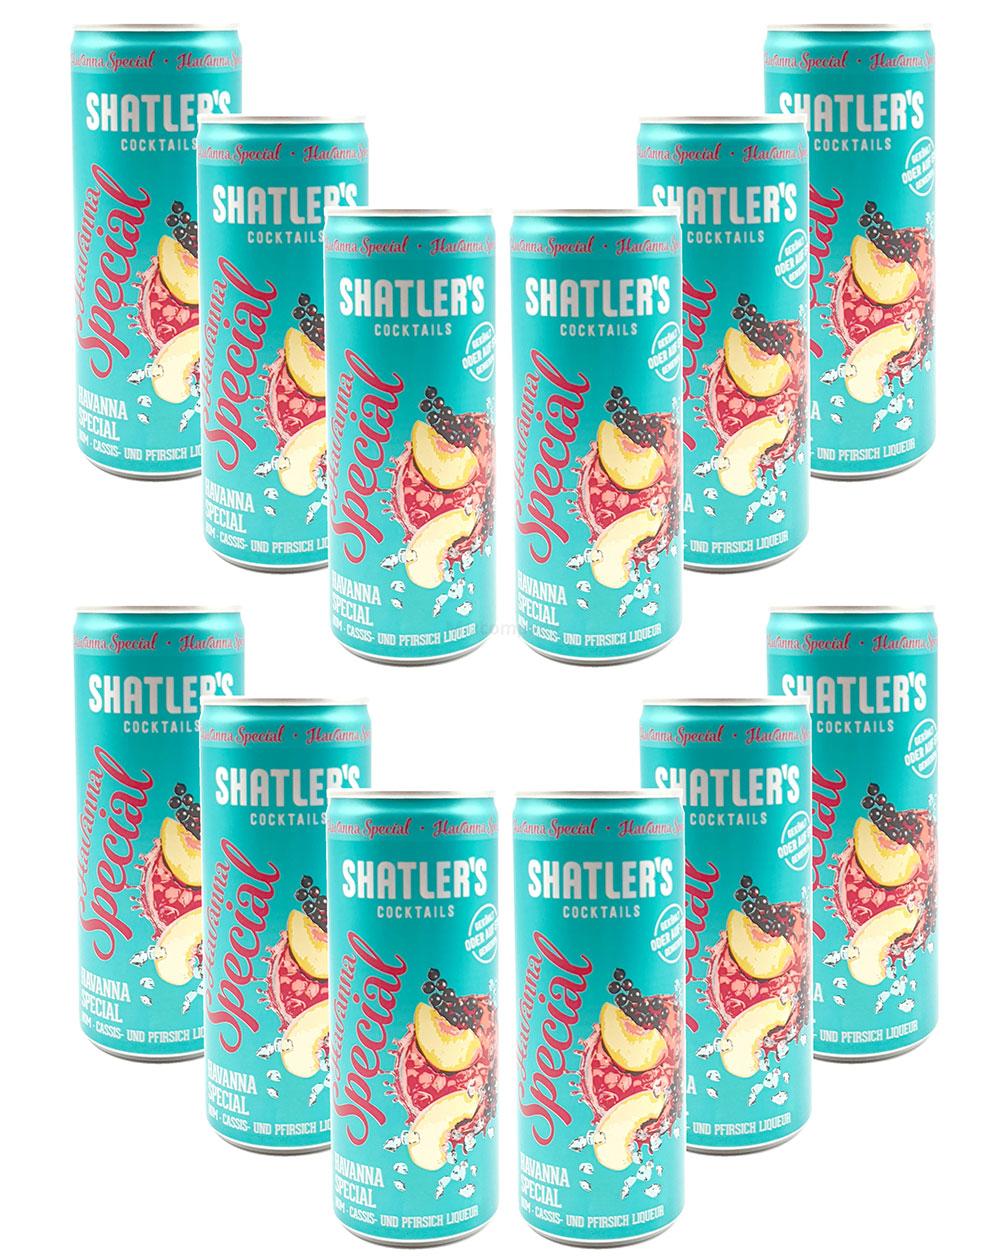 Shatlers Cocktail - 12er Set Shatlers Havanna Special 0,25L (10,1% Vol) inklusive Pfand EINWEG - Shatlers Cocktail - Ready to Go- [Enthält Sulfite]